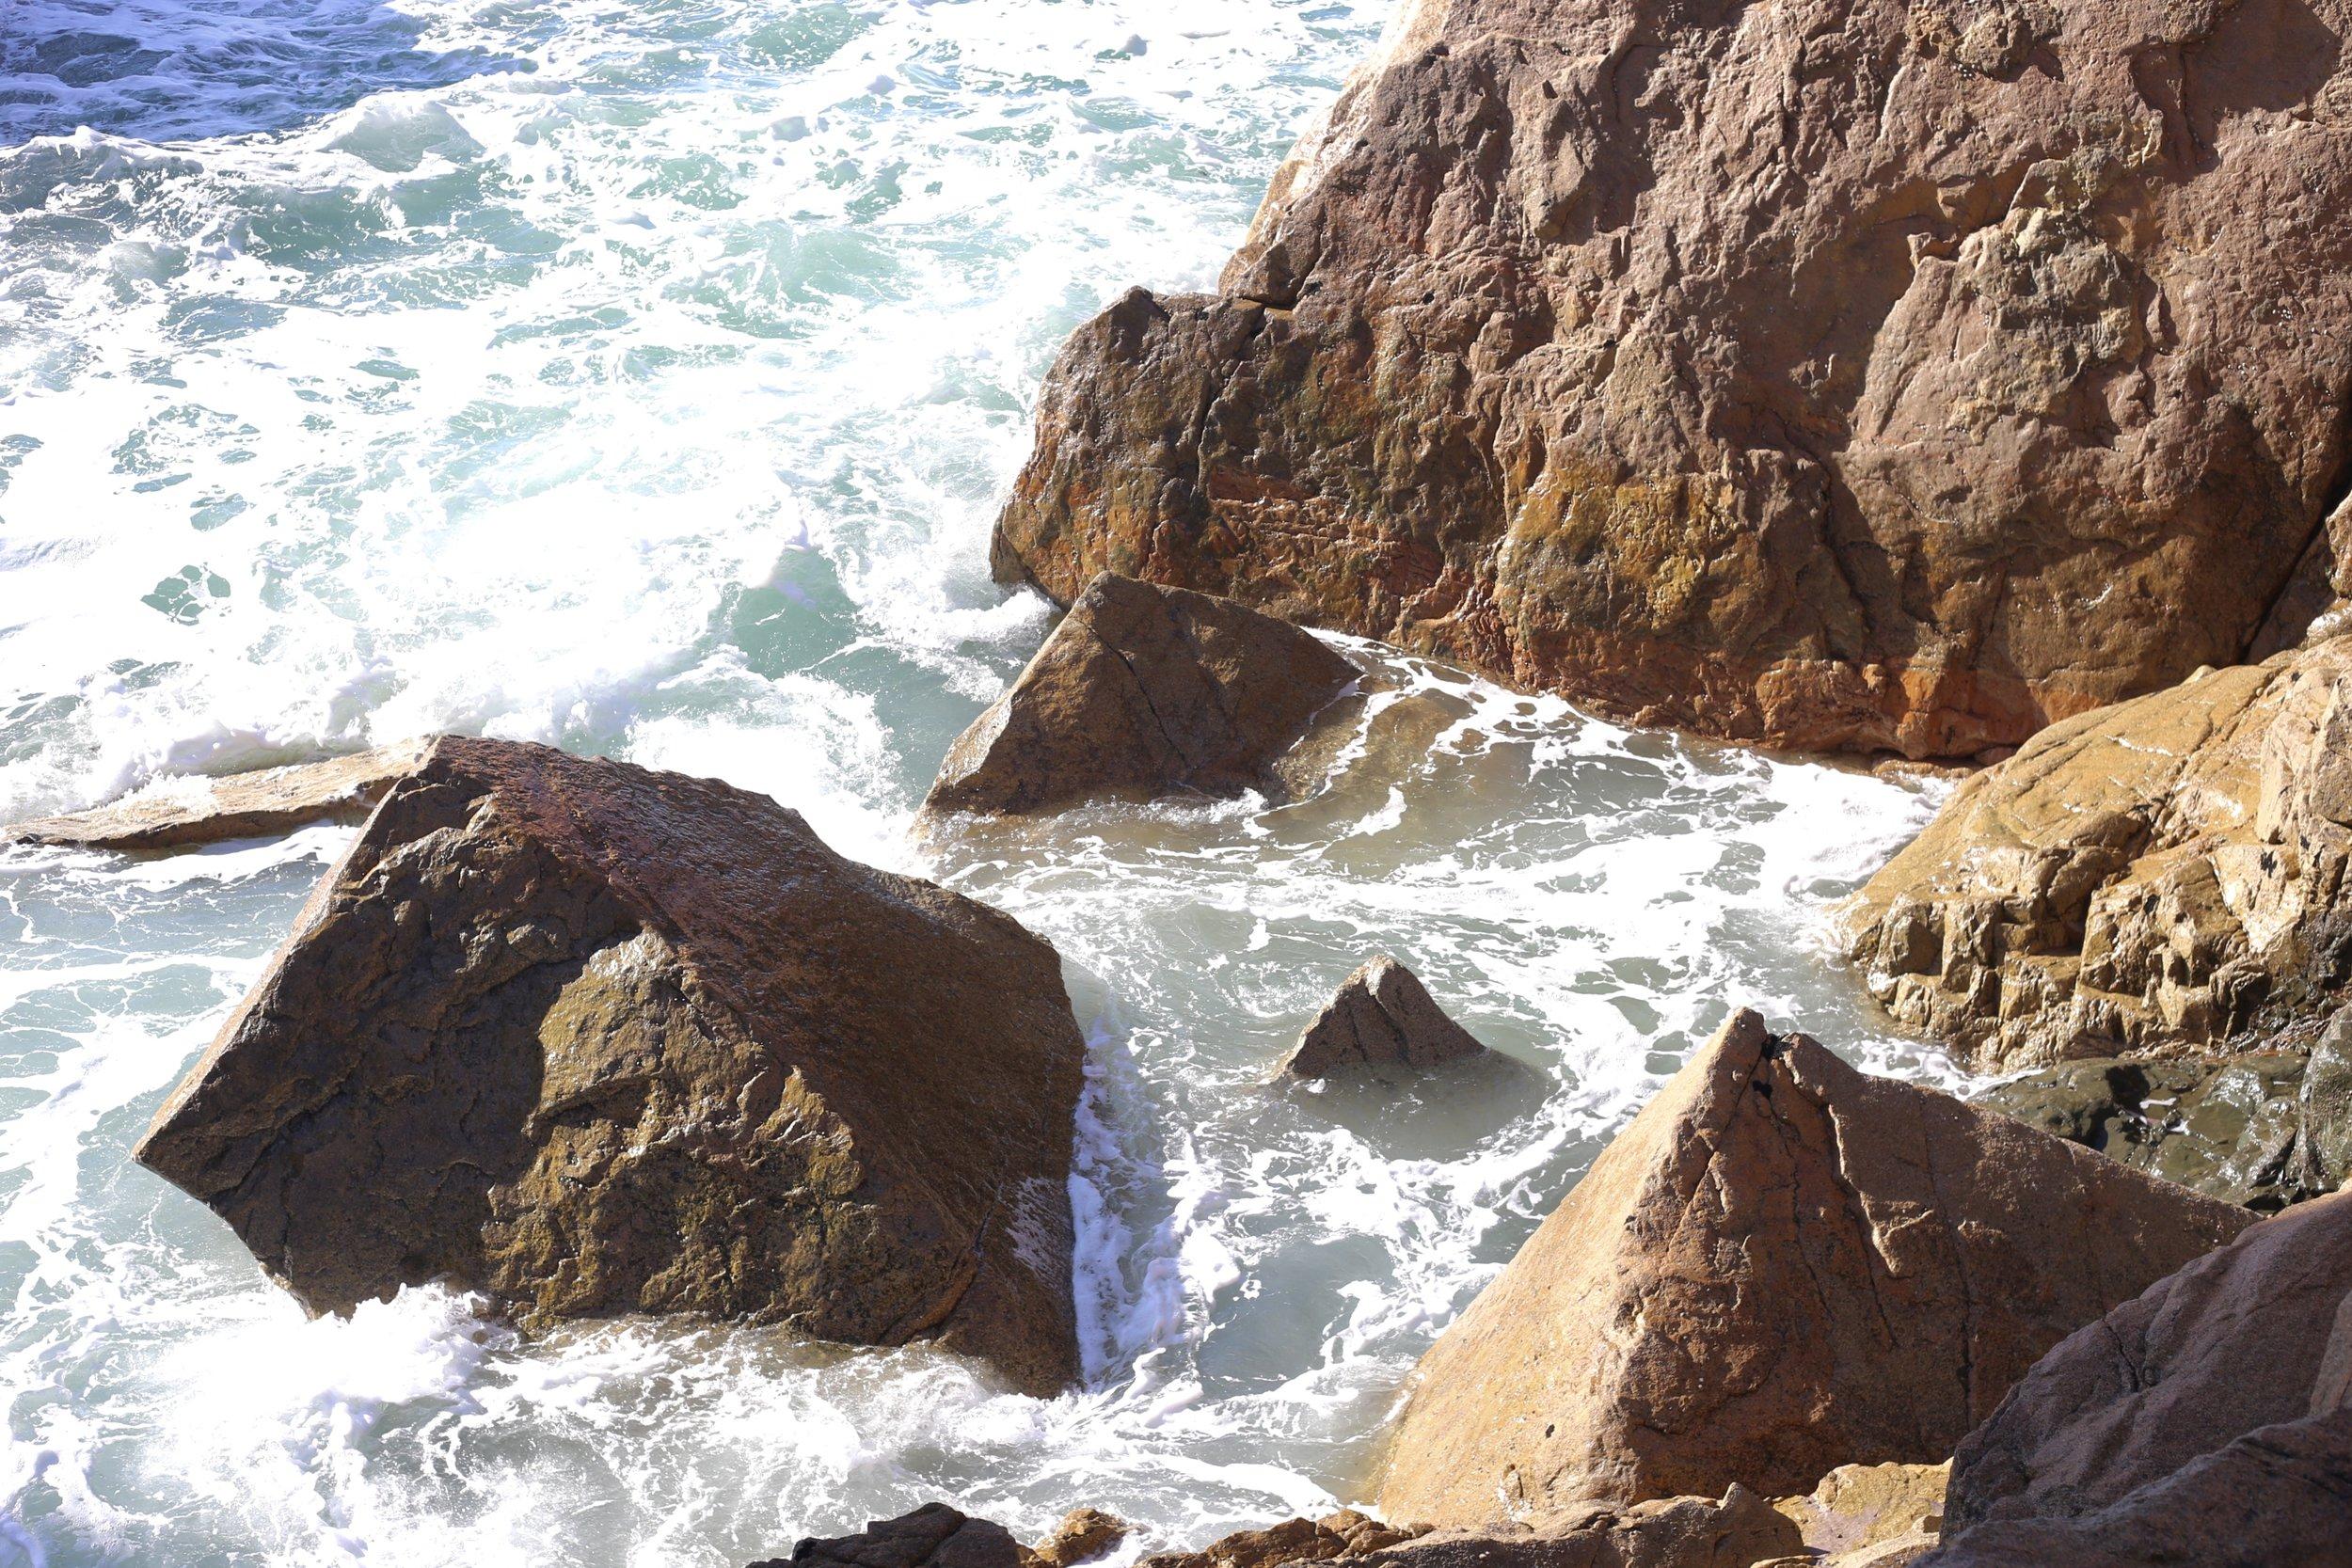 Pyramid shaped rose rocks on the Granit Coast.